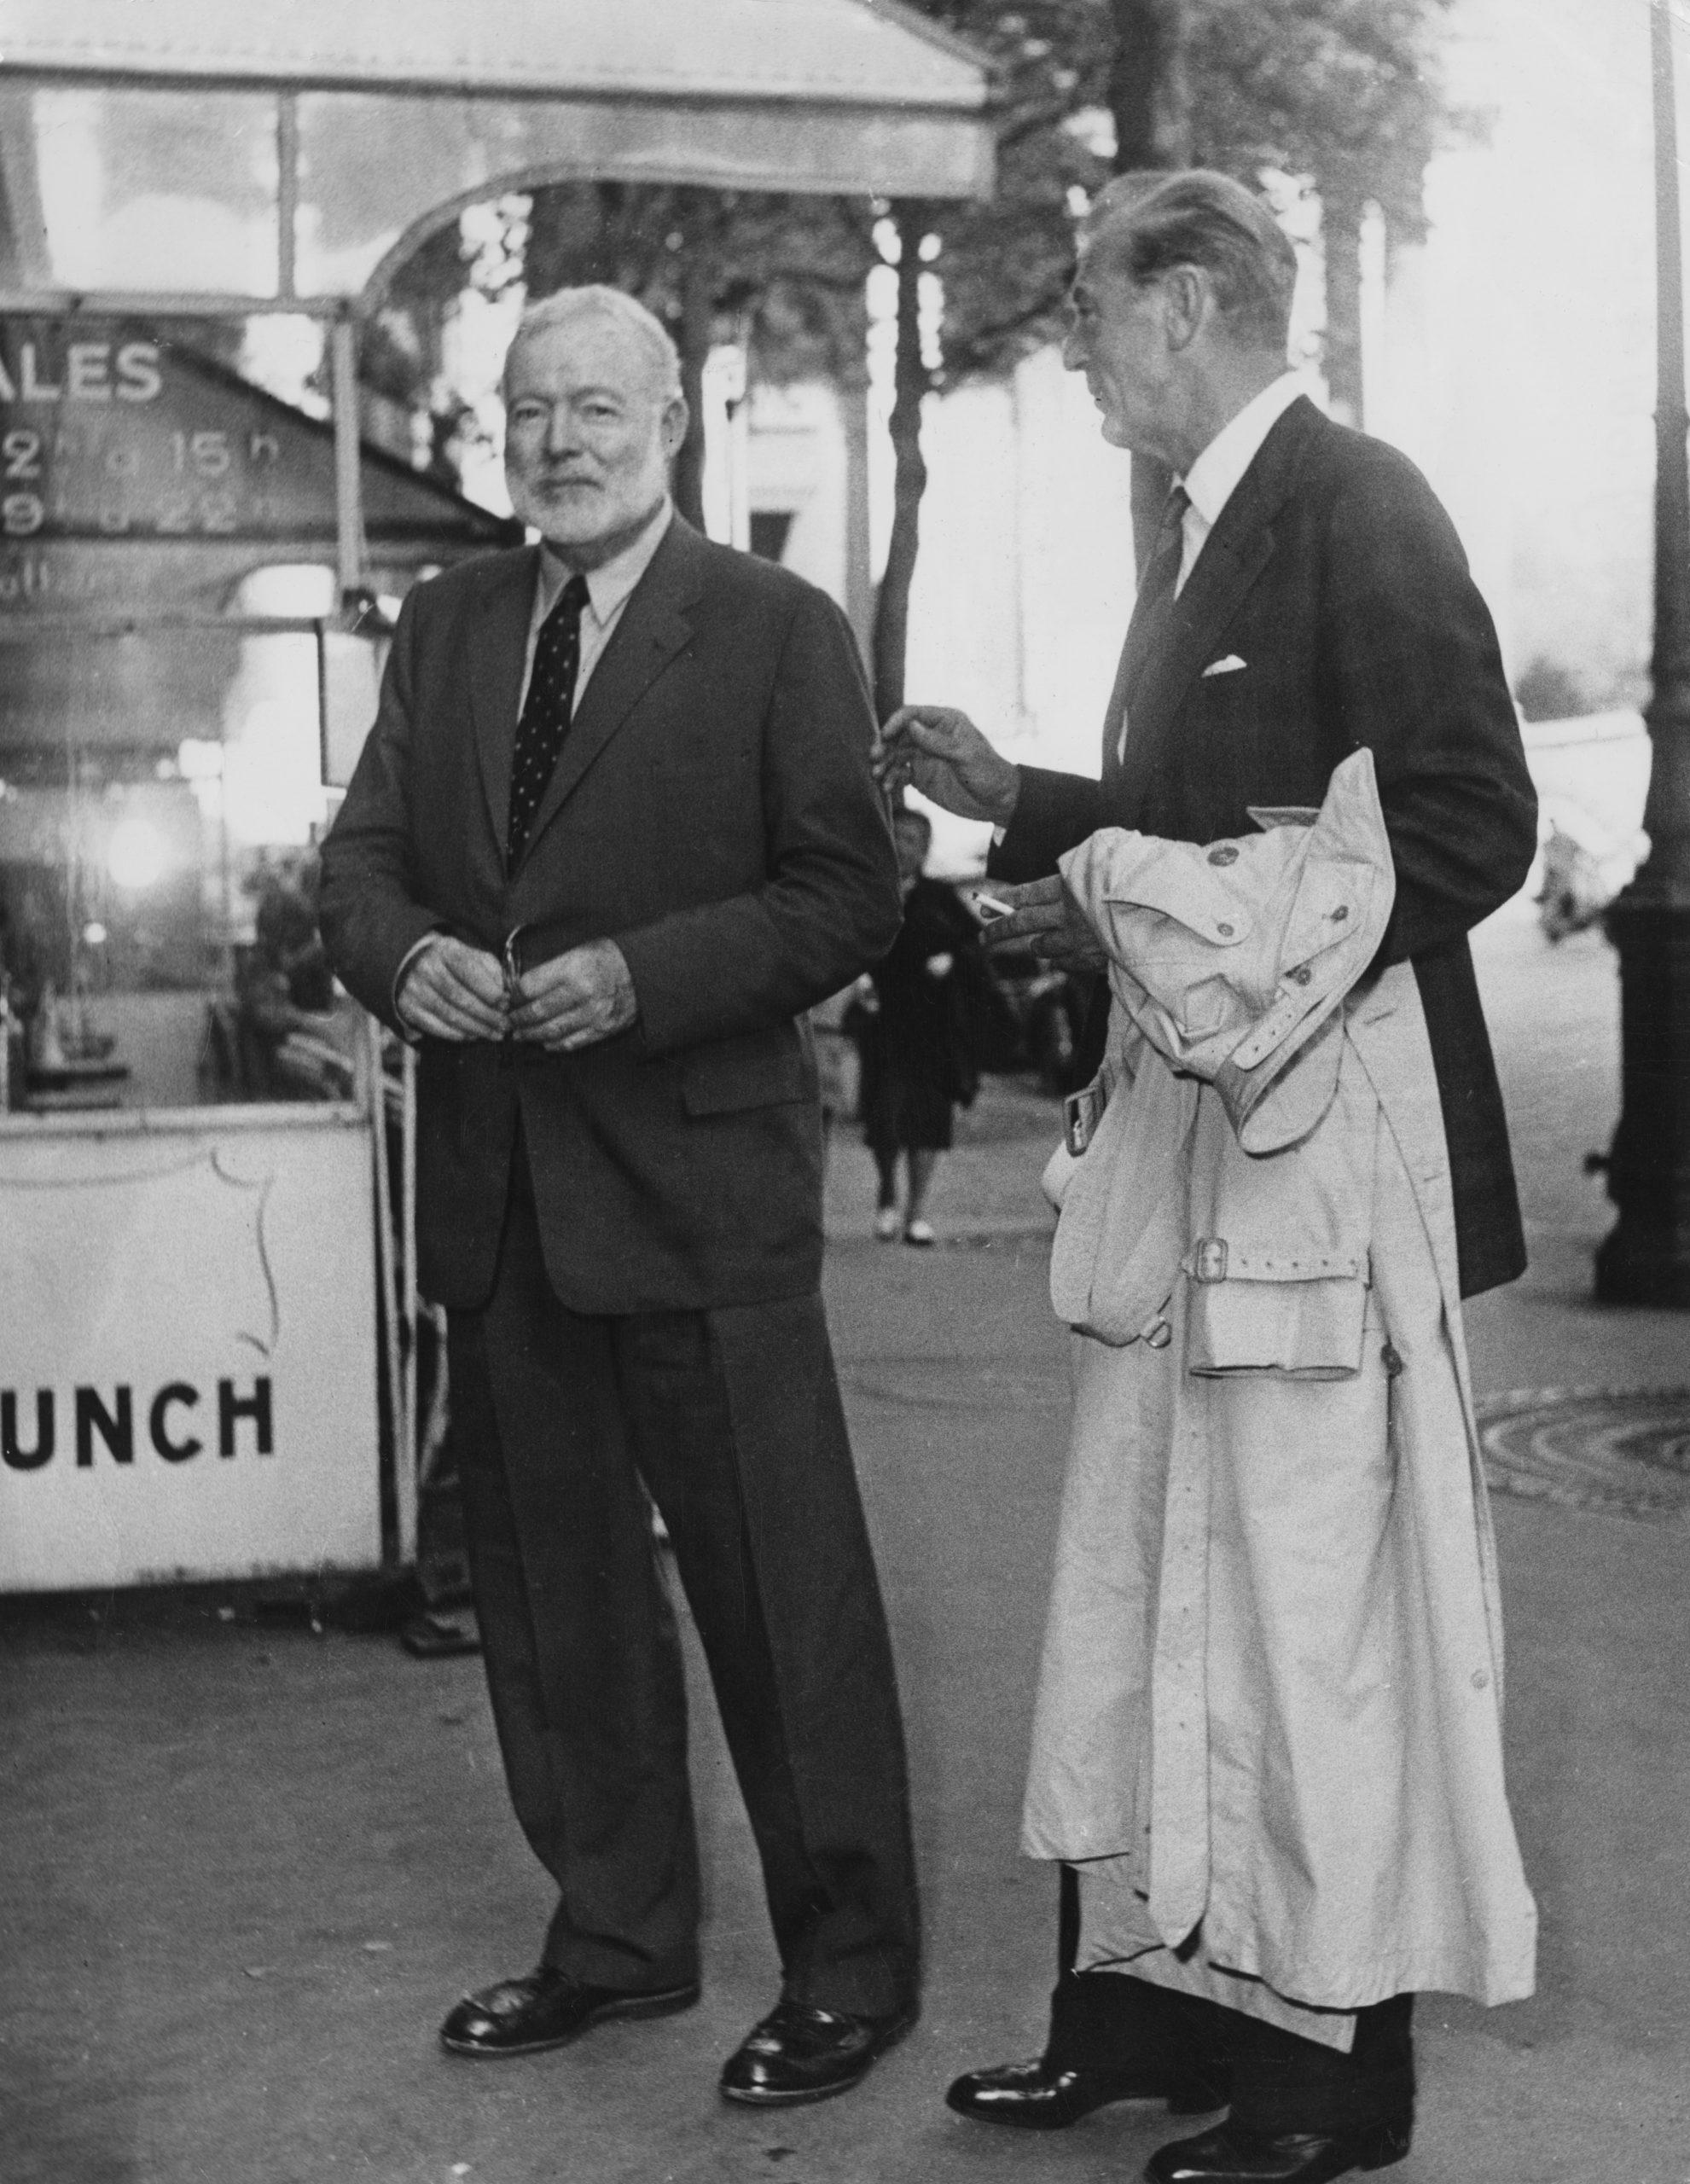 Ernest Hemingway y Gary Cooper en París en 1956